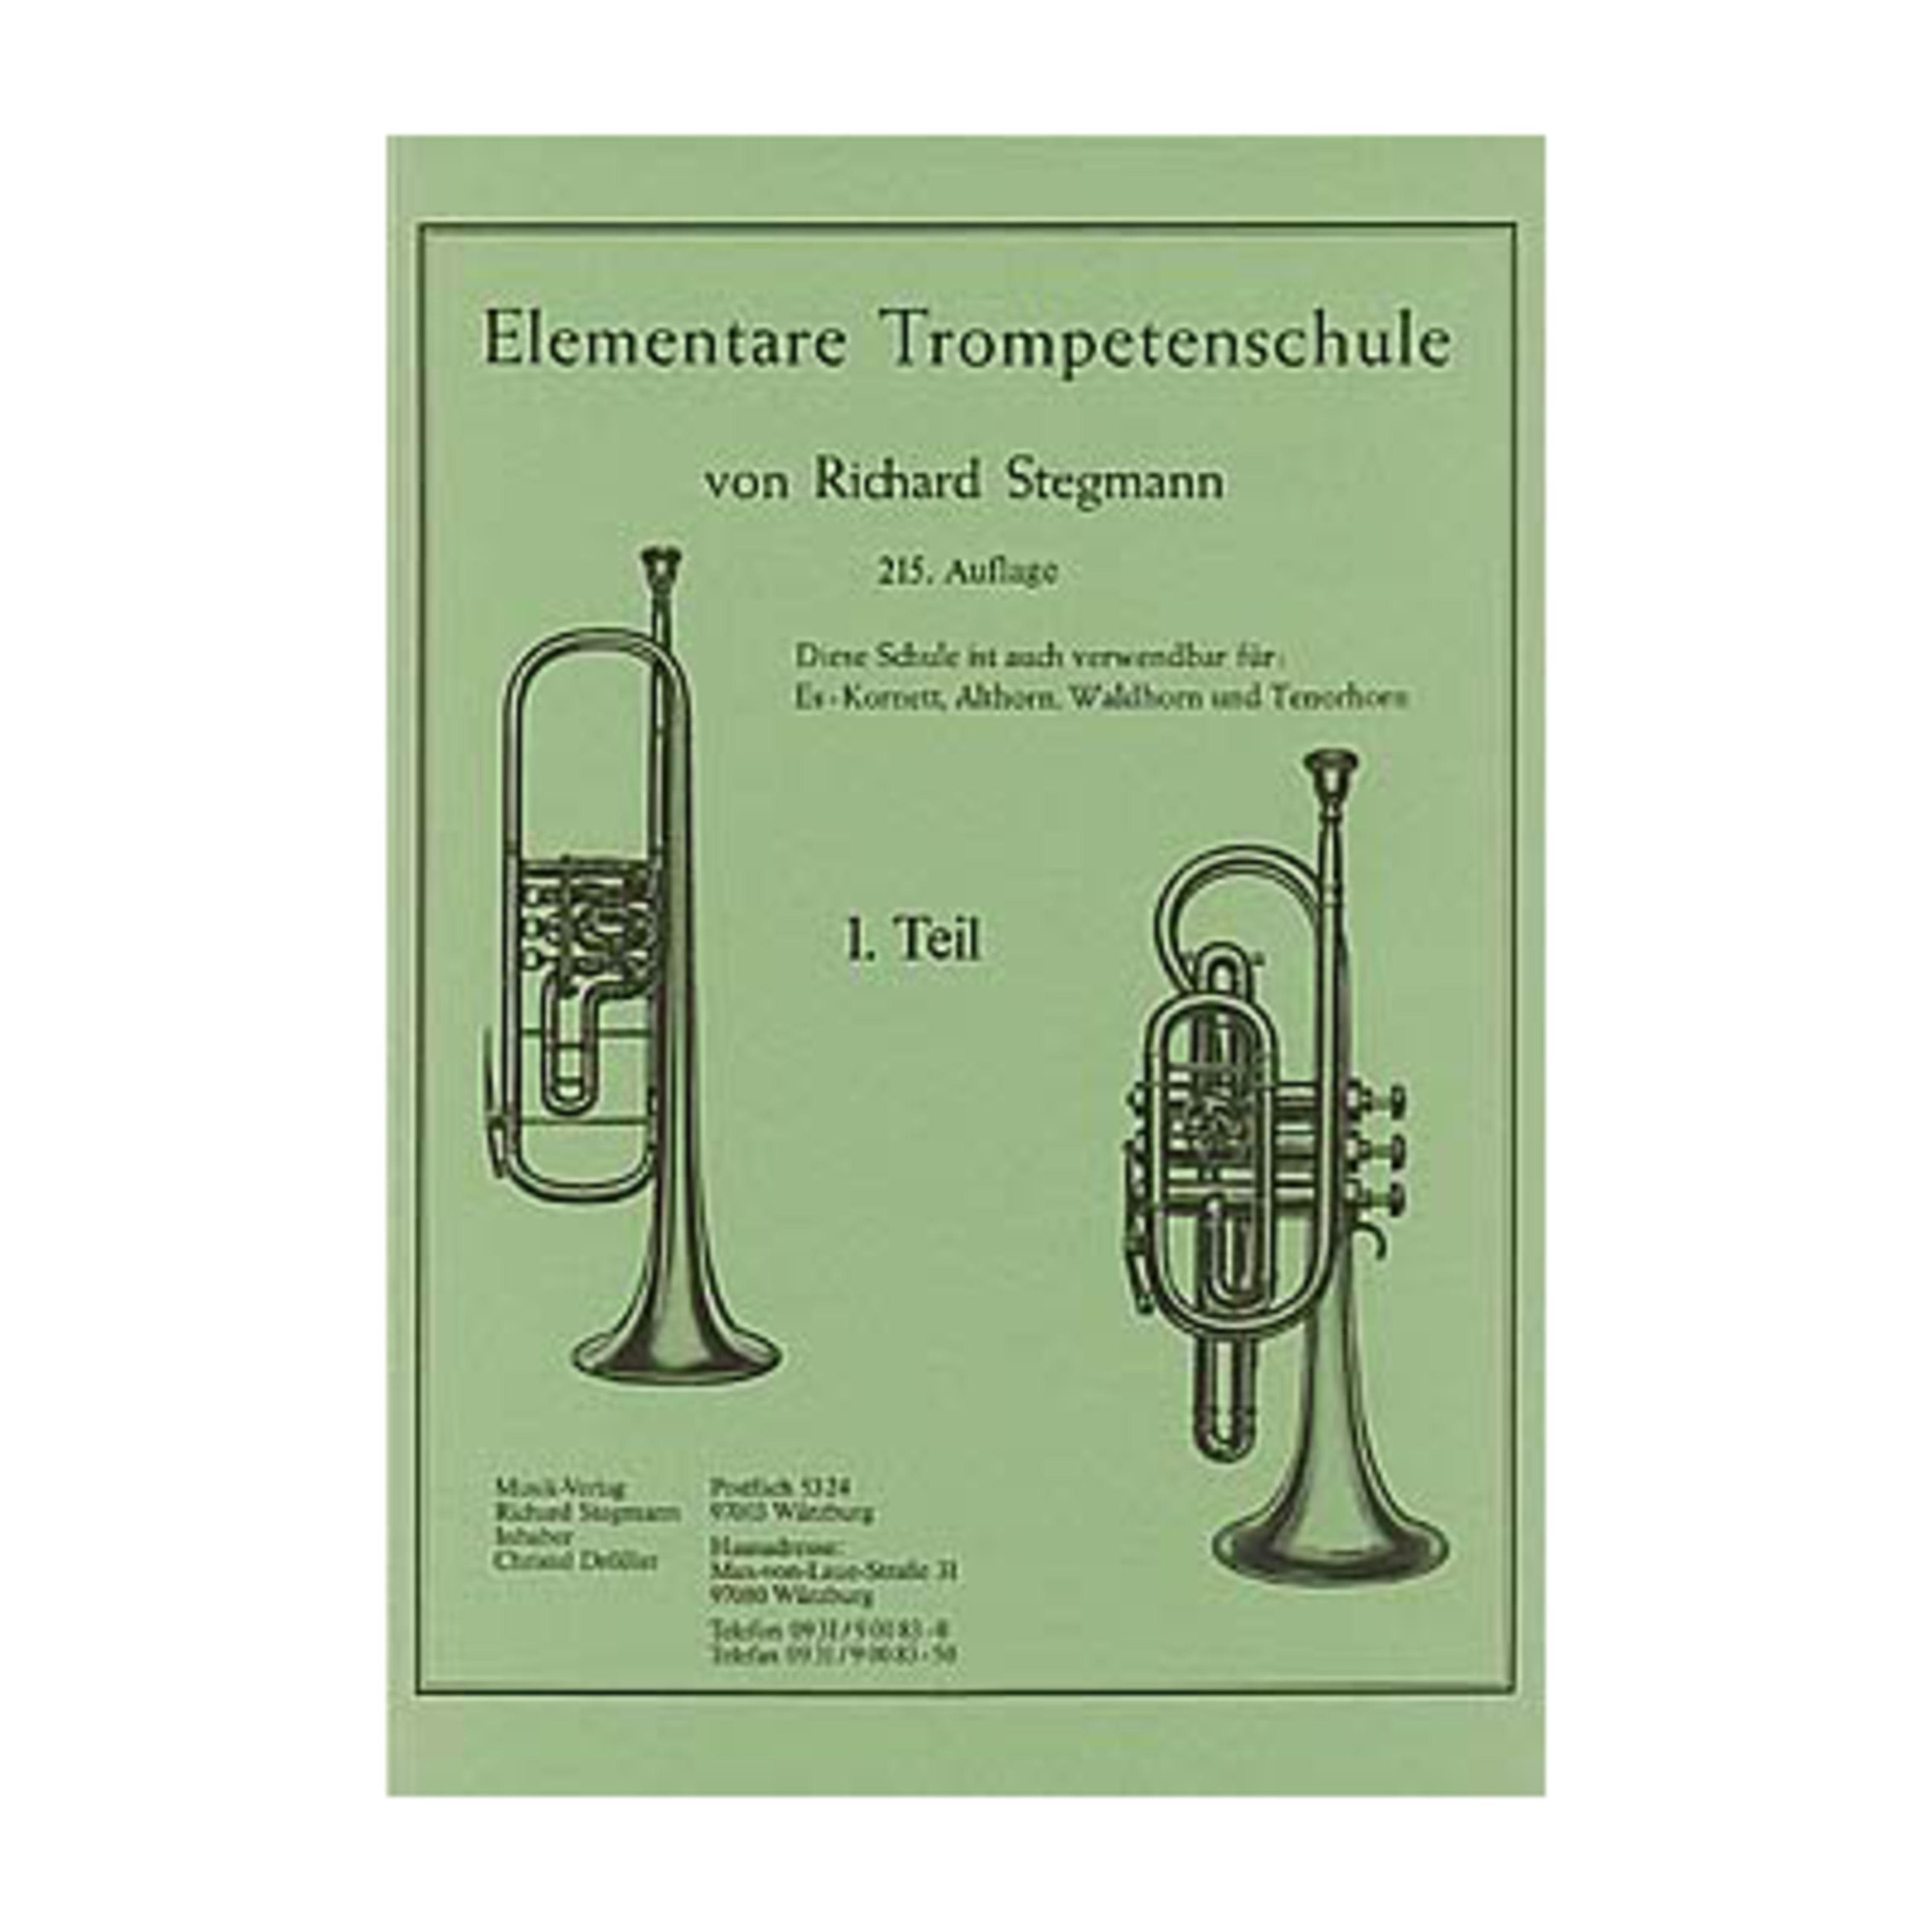 Richard Stegmann - Elementare Trompetenschule 1 Richard Stegmann Stegmann 1 / 107788